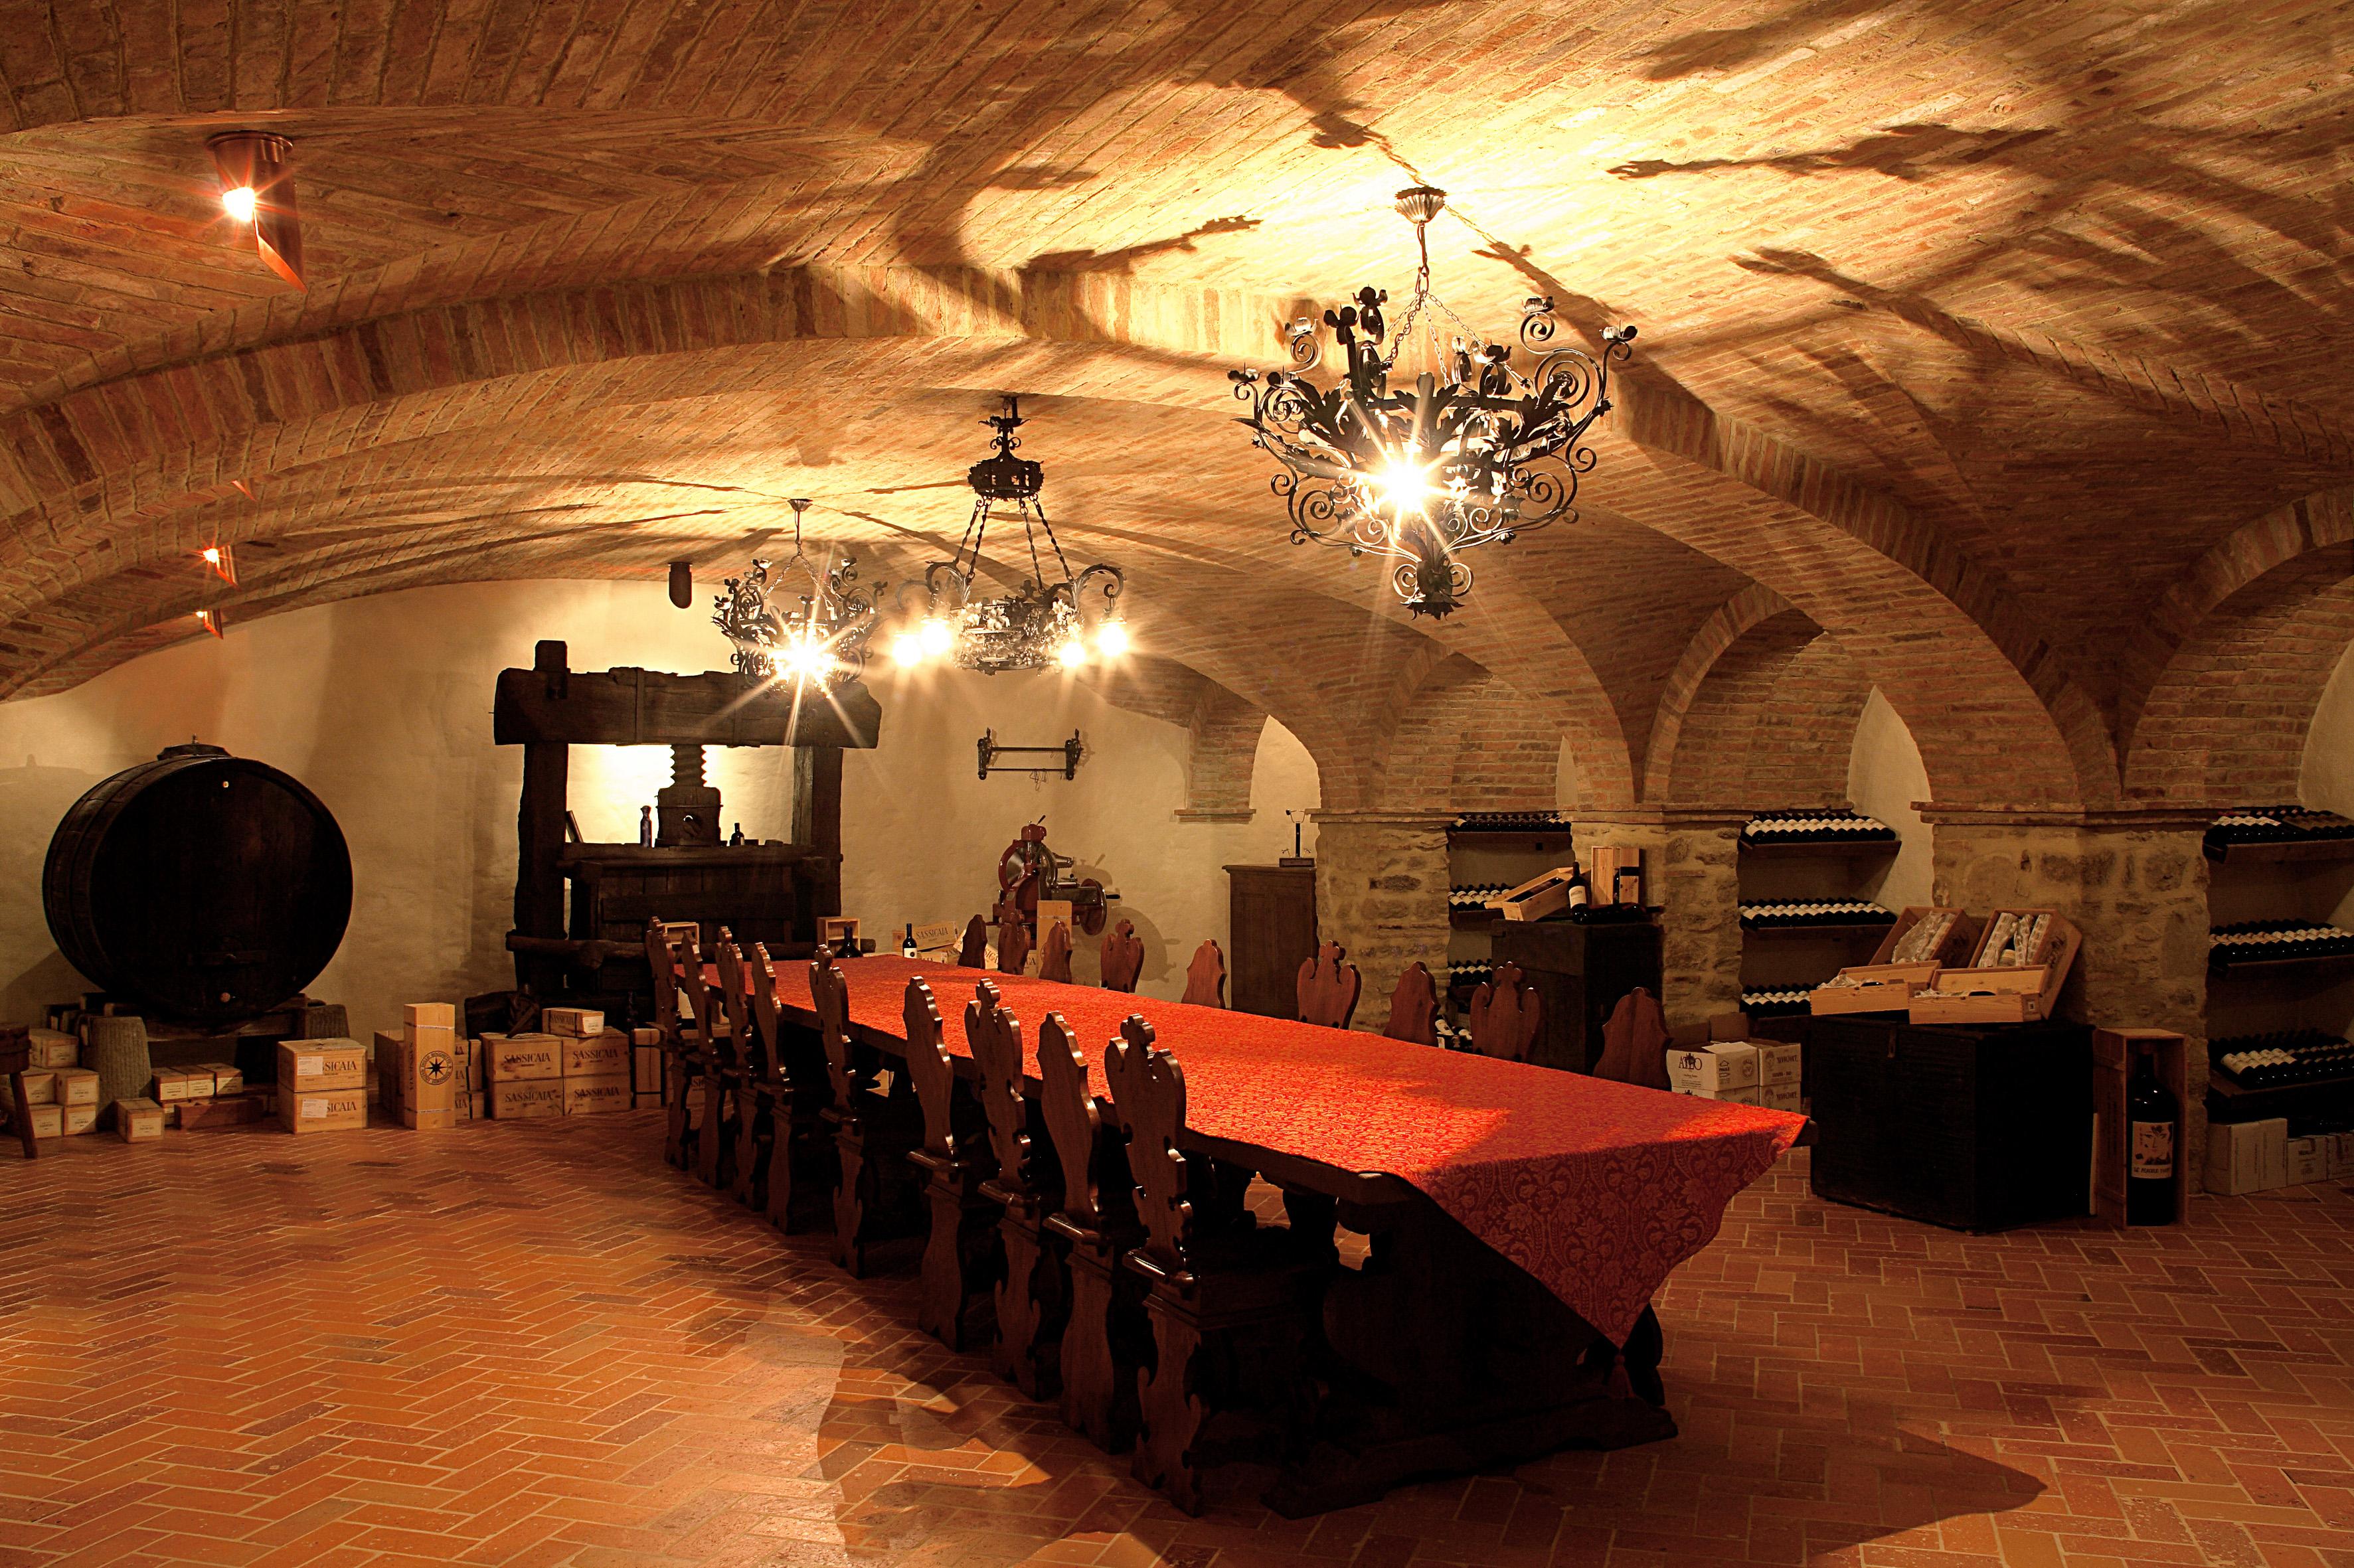 WTH World Tuscan HousesLa cantina - WTH World Tuscan Houses